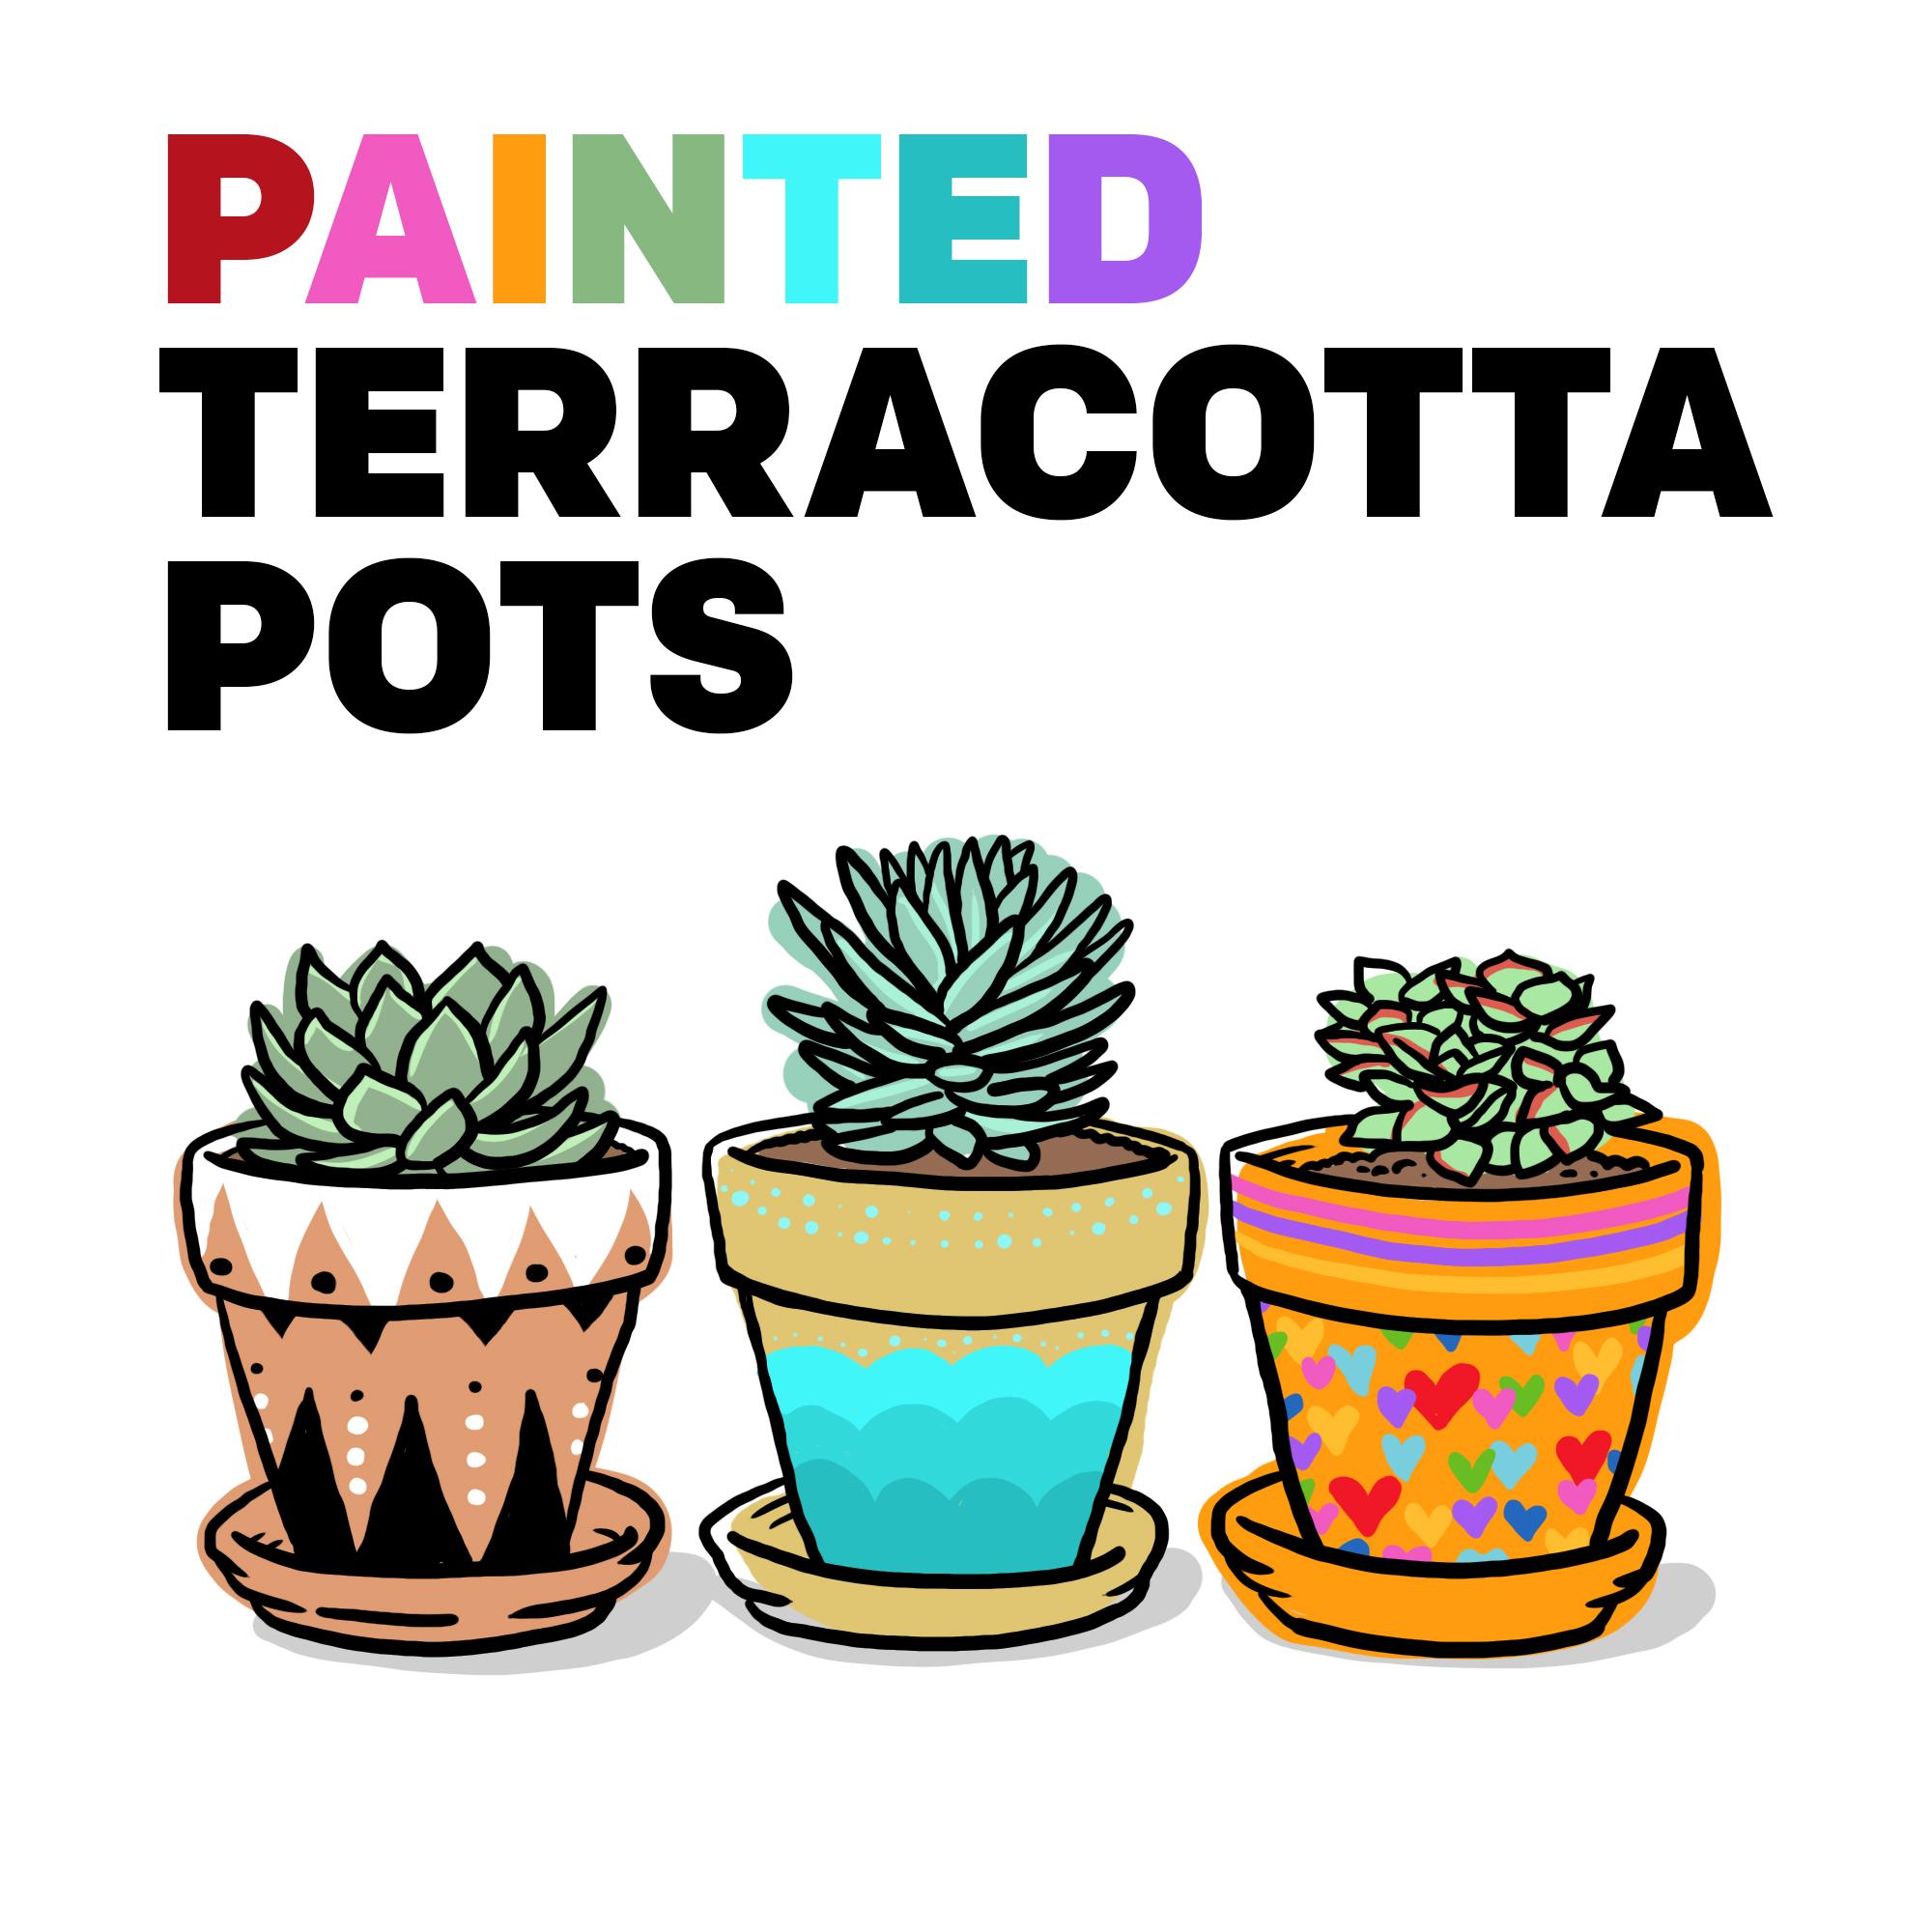 Painting Terracotta Pots for Succulents